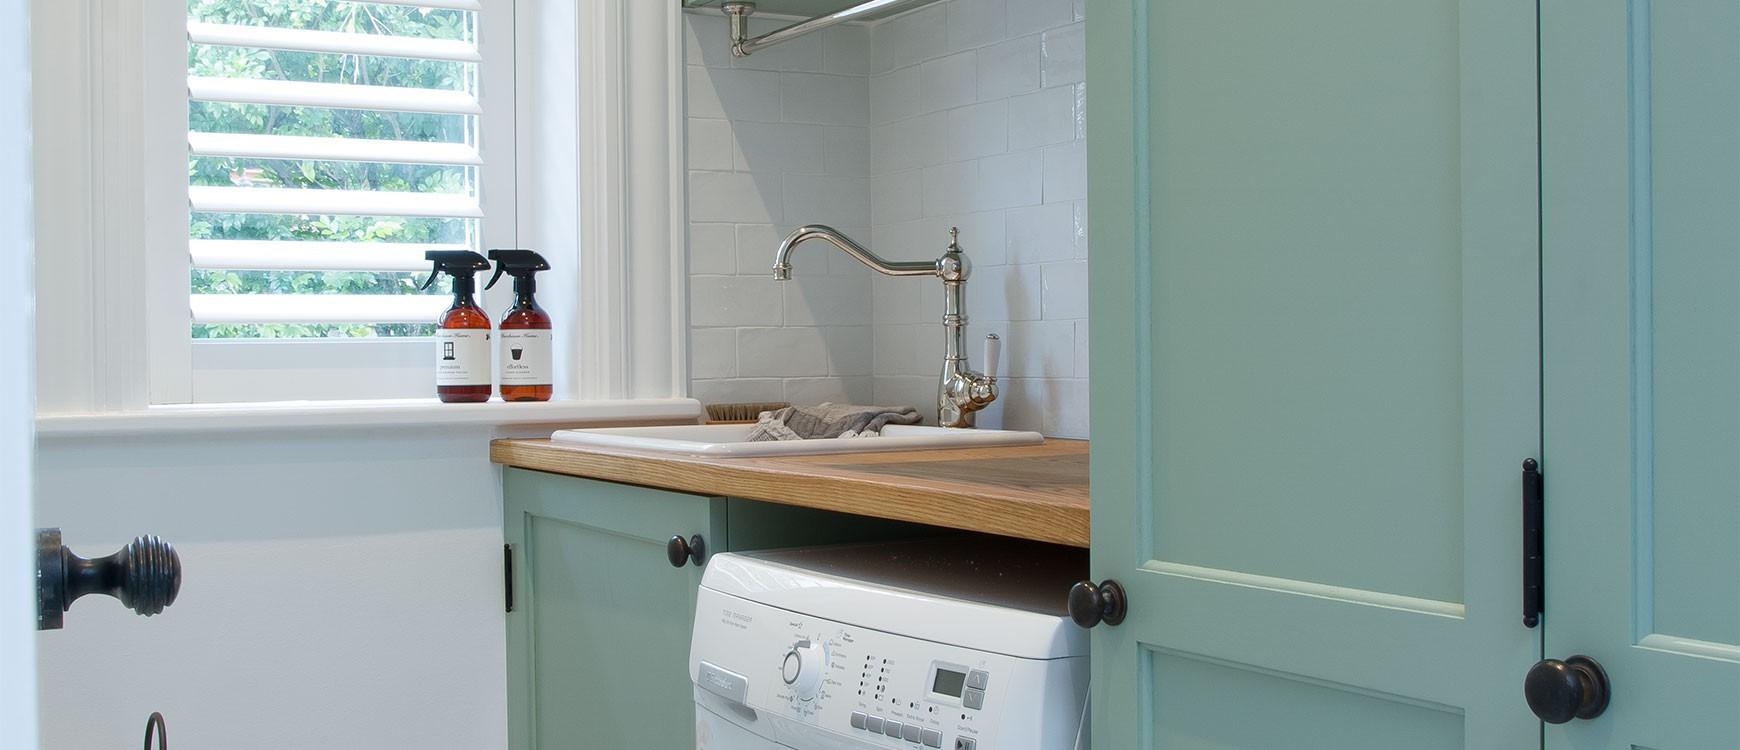 Laundry Design Ideas | Kitchen & Laundry Renovation | The English ...